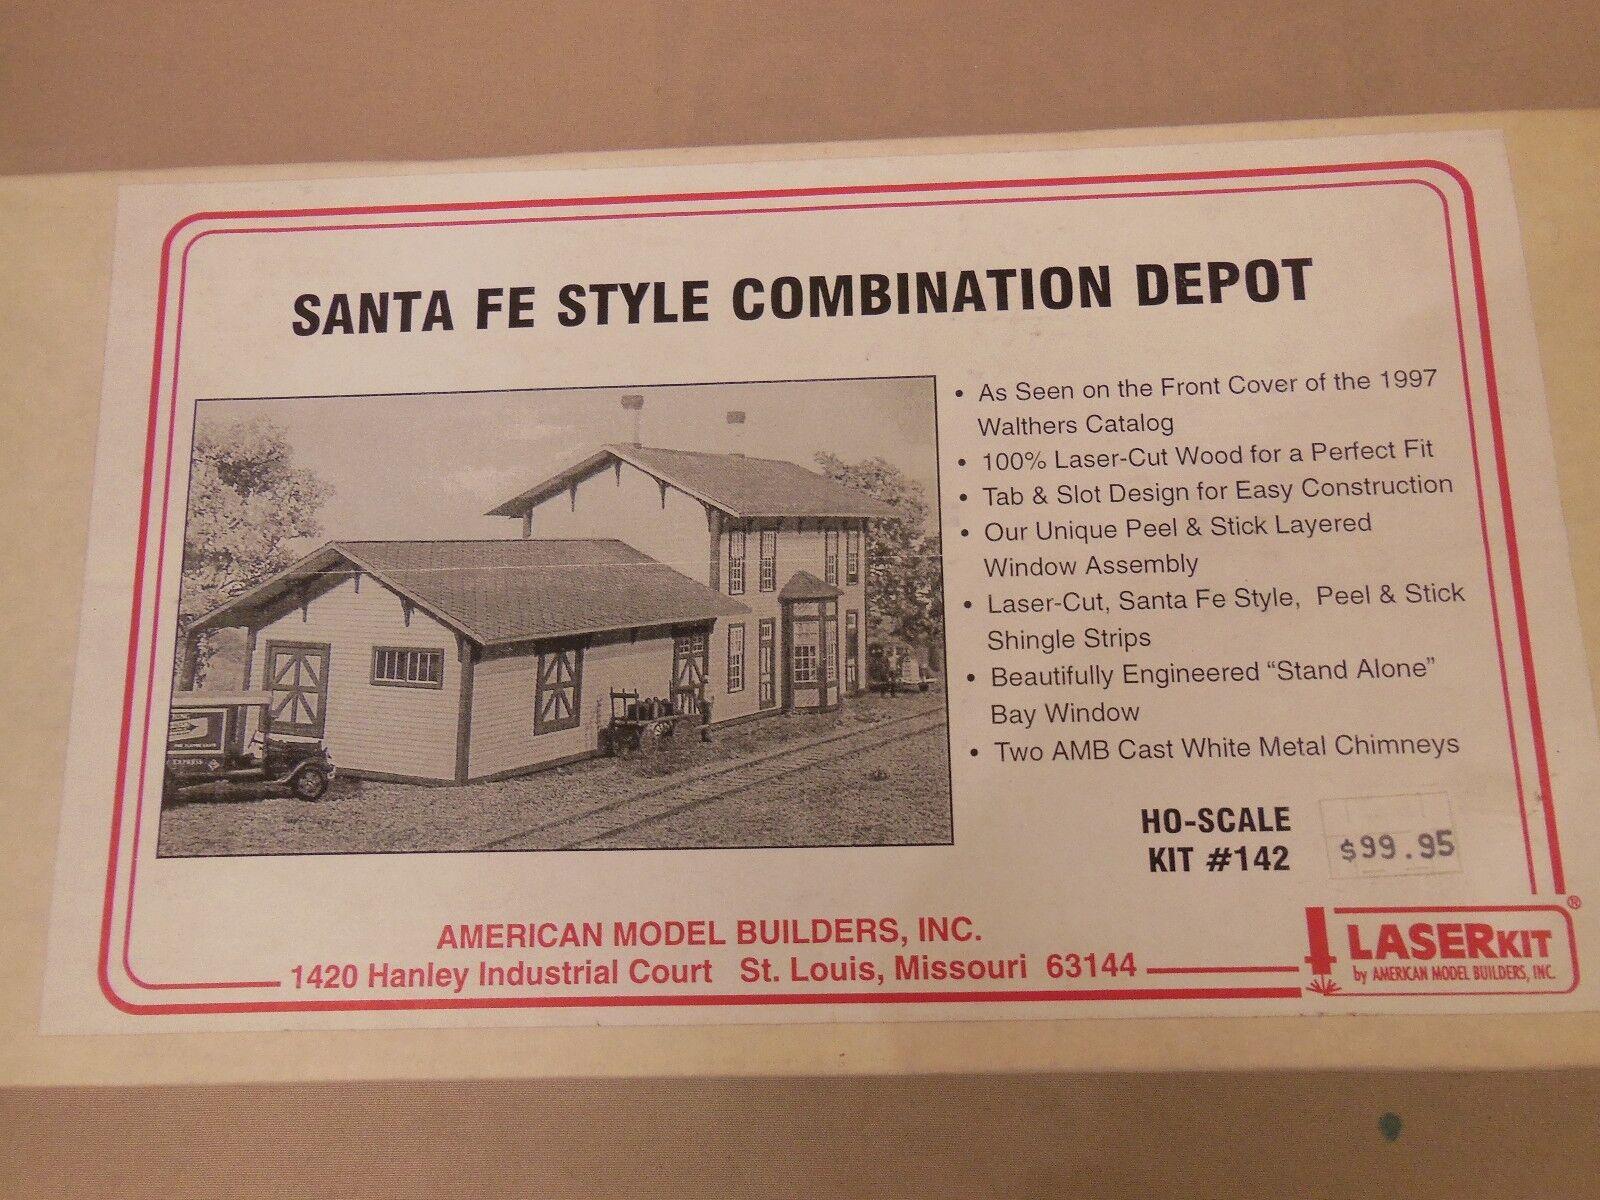 Escala Ho Modelo Americano constructores Santa Primera Edición Estilo combinación Depot láser kit